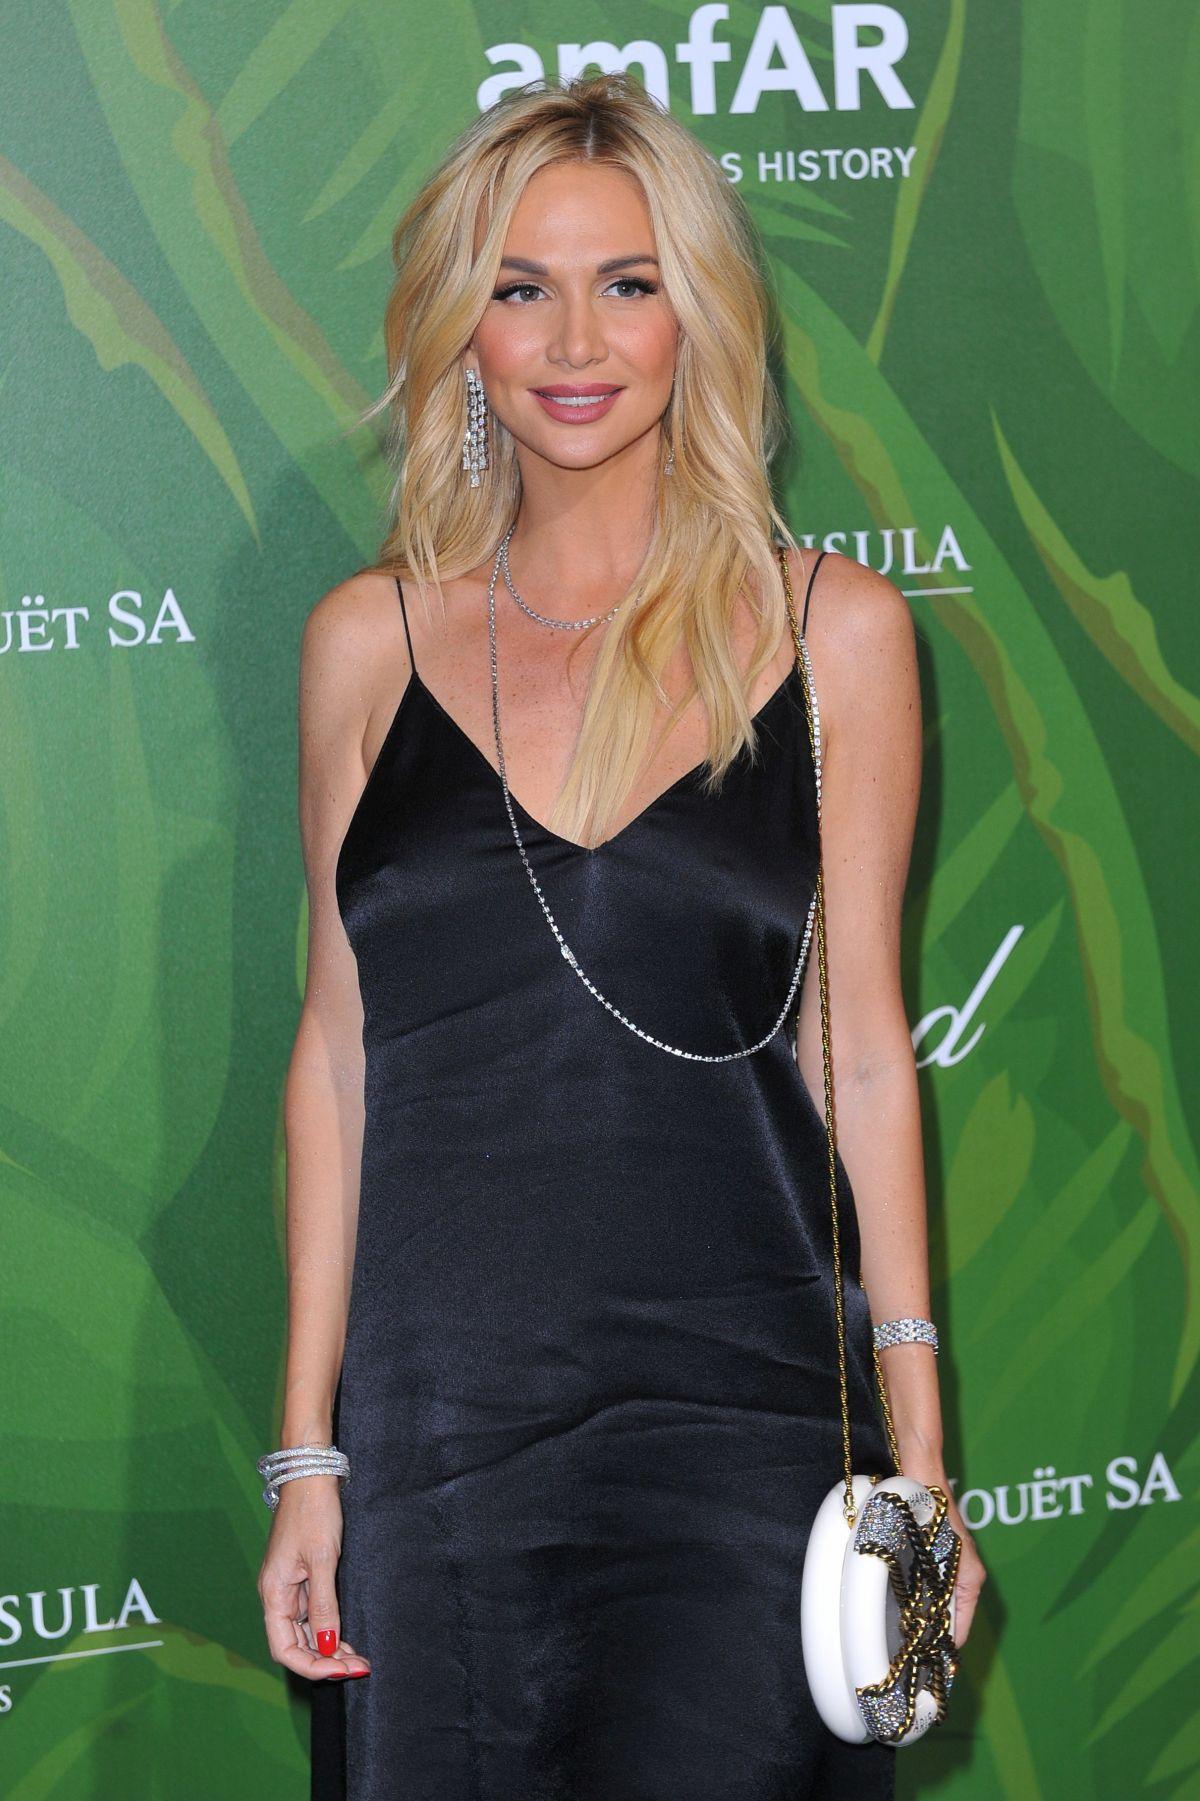 ¿Cuánto mide Victoria Lopyreva? - Real height Victoria-lopyreva-at-amfar-paris-dinner-7